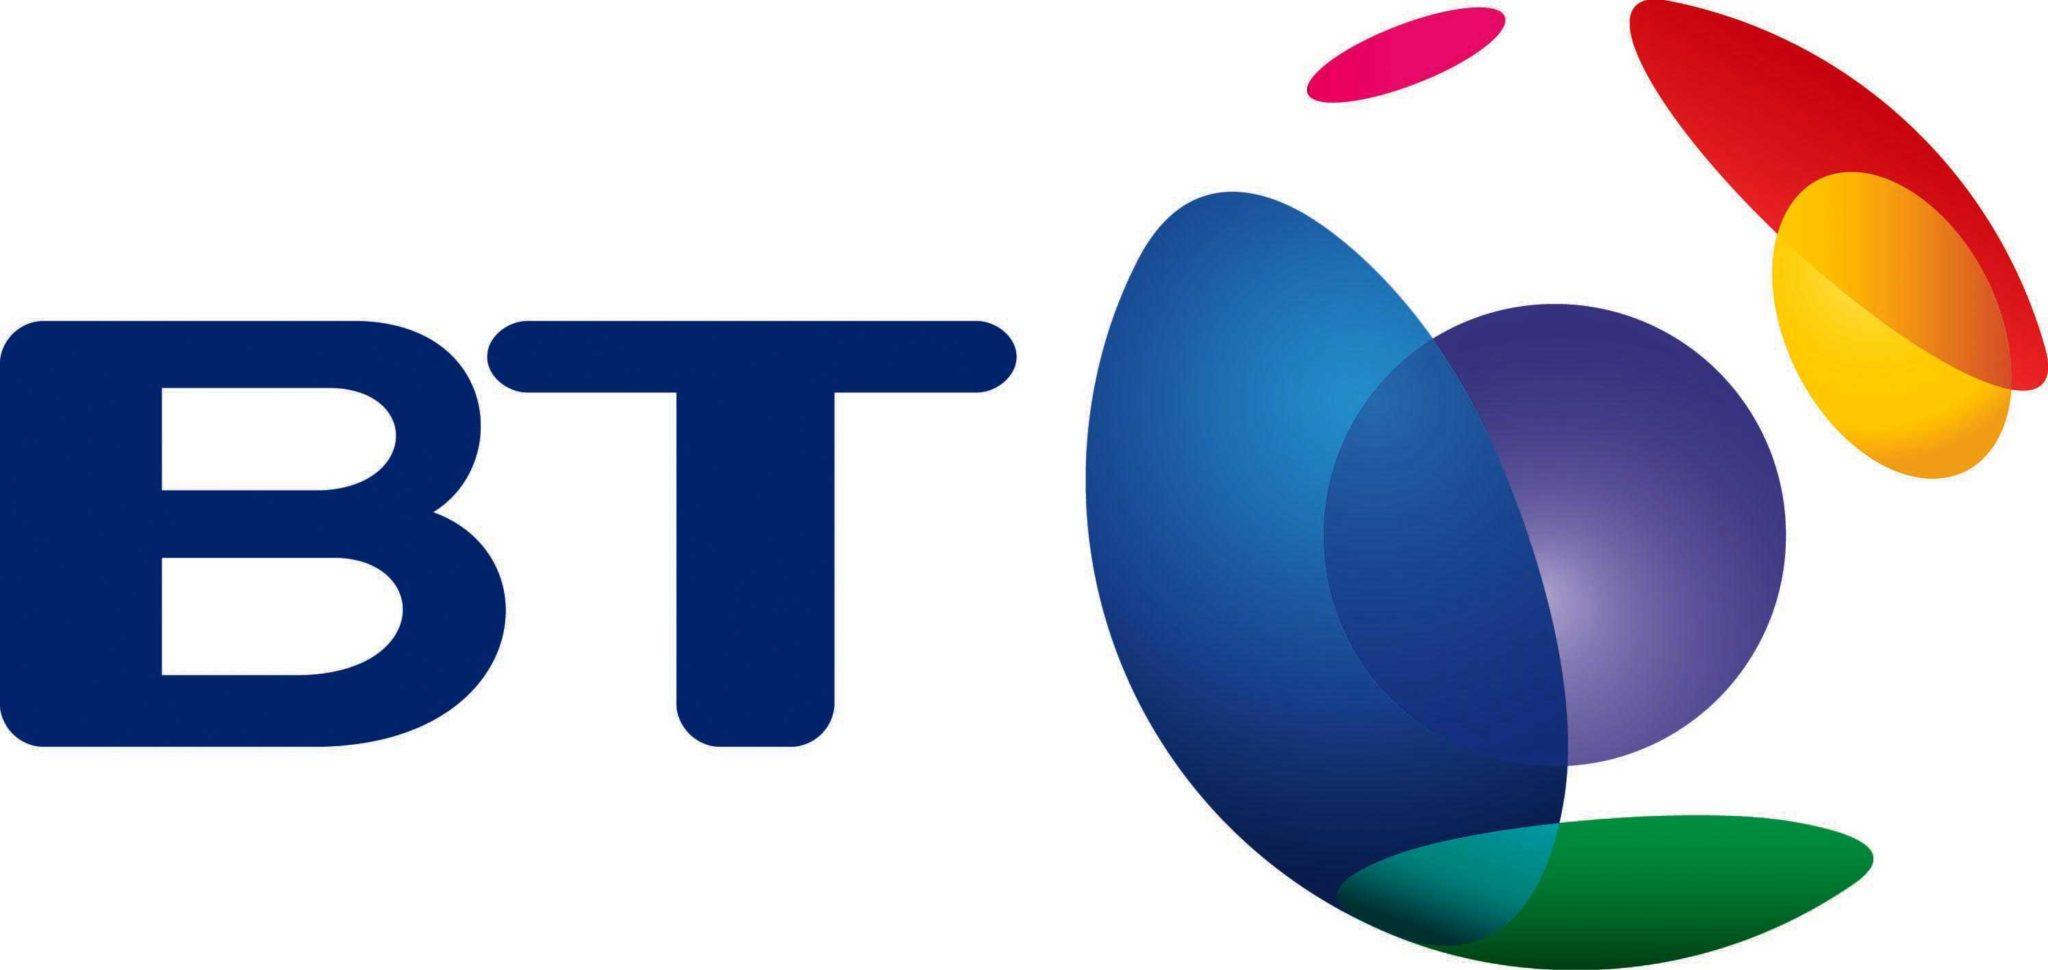 BT broadband telephone number